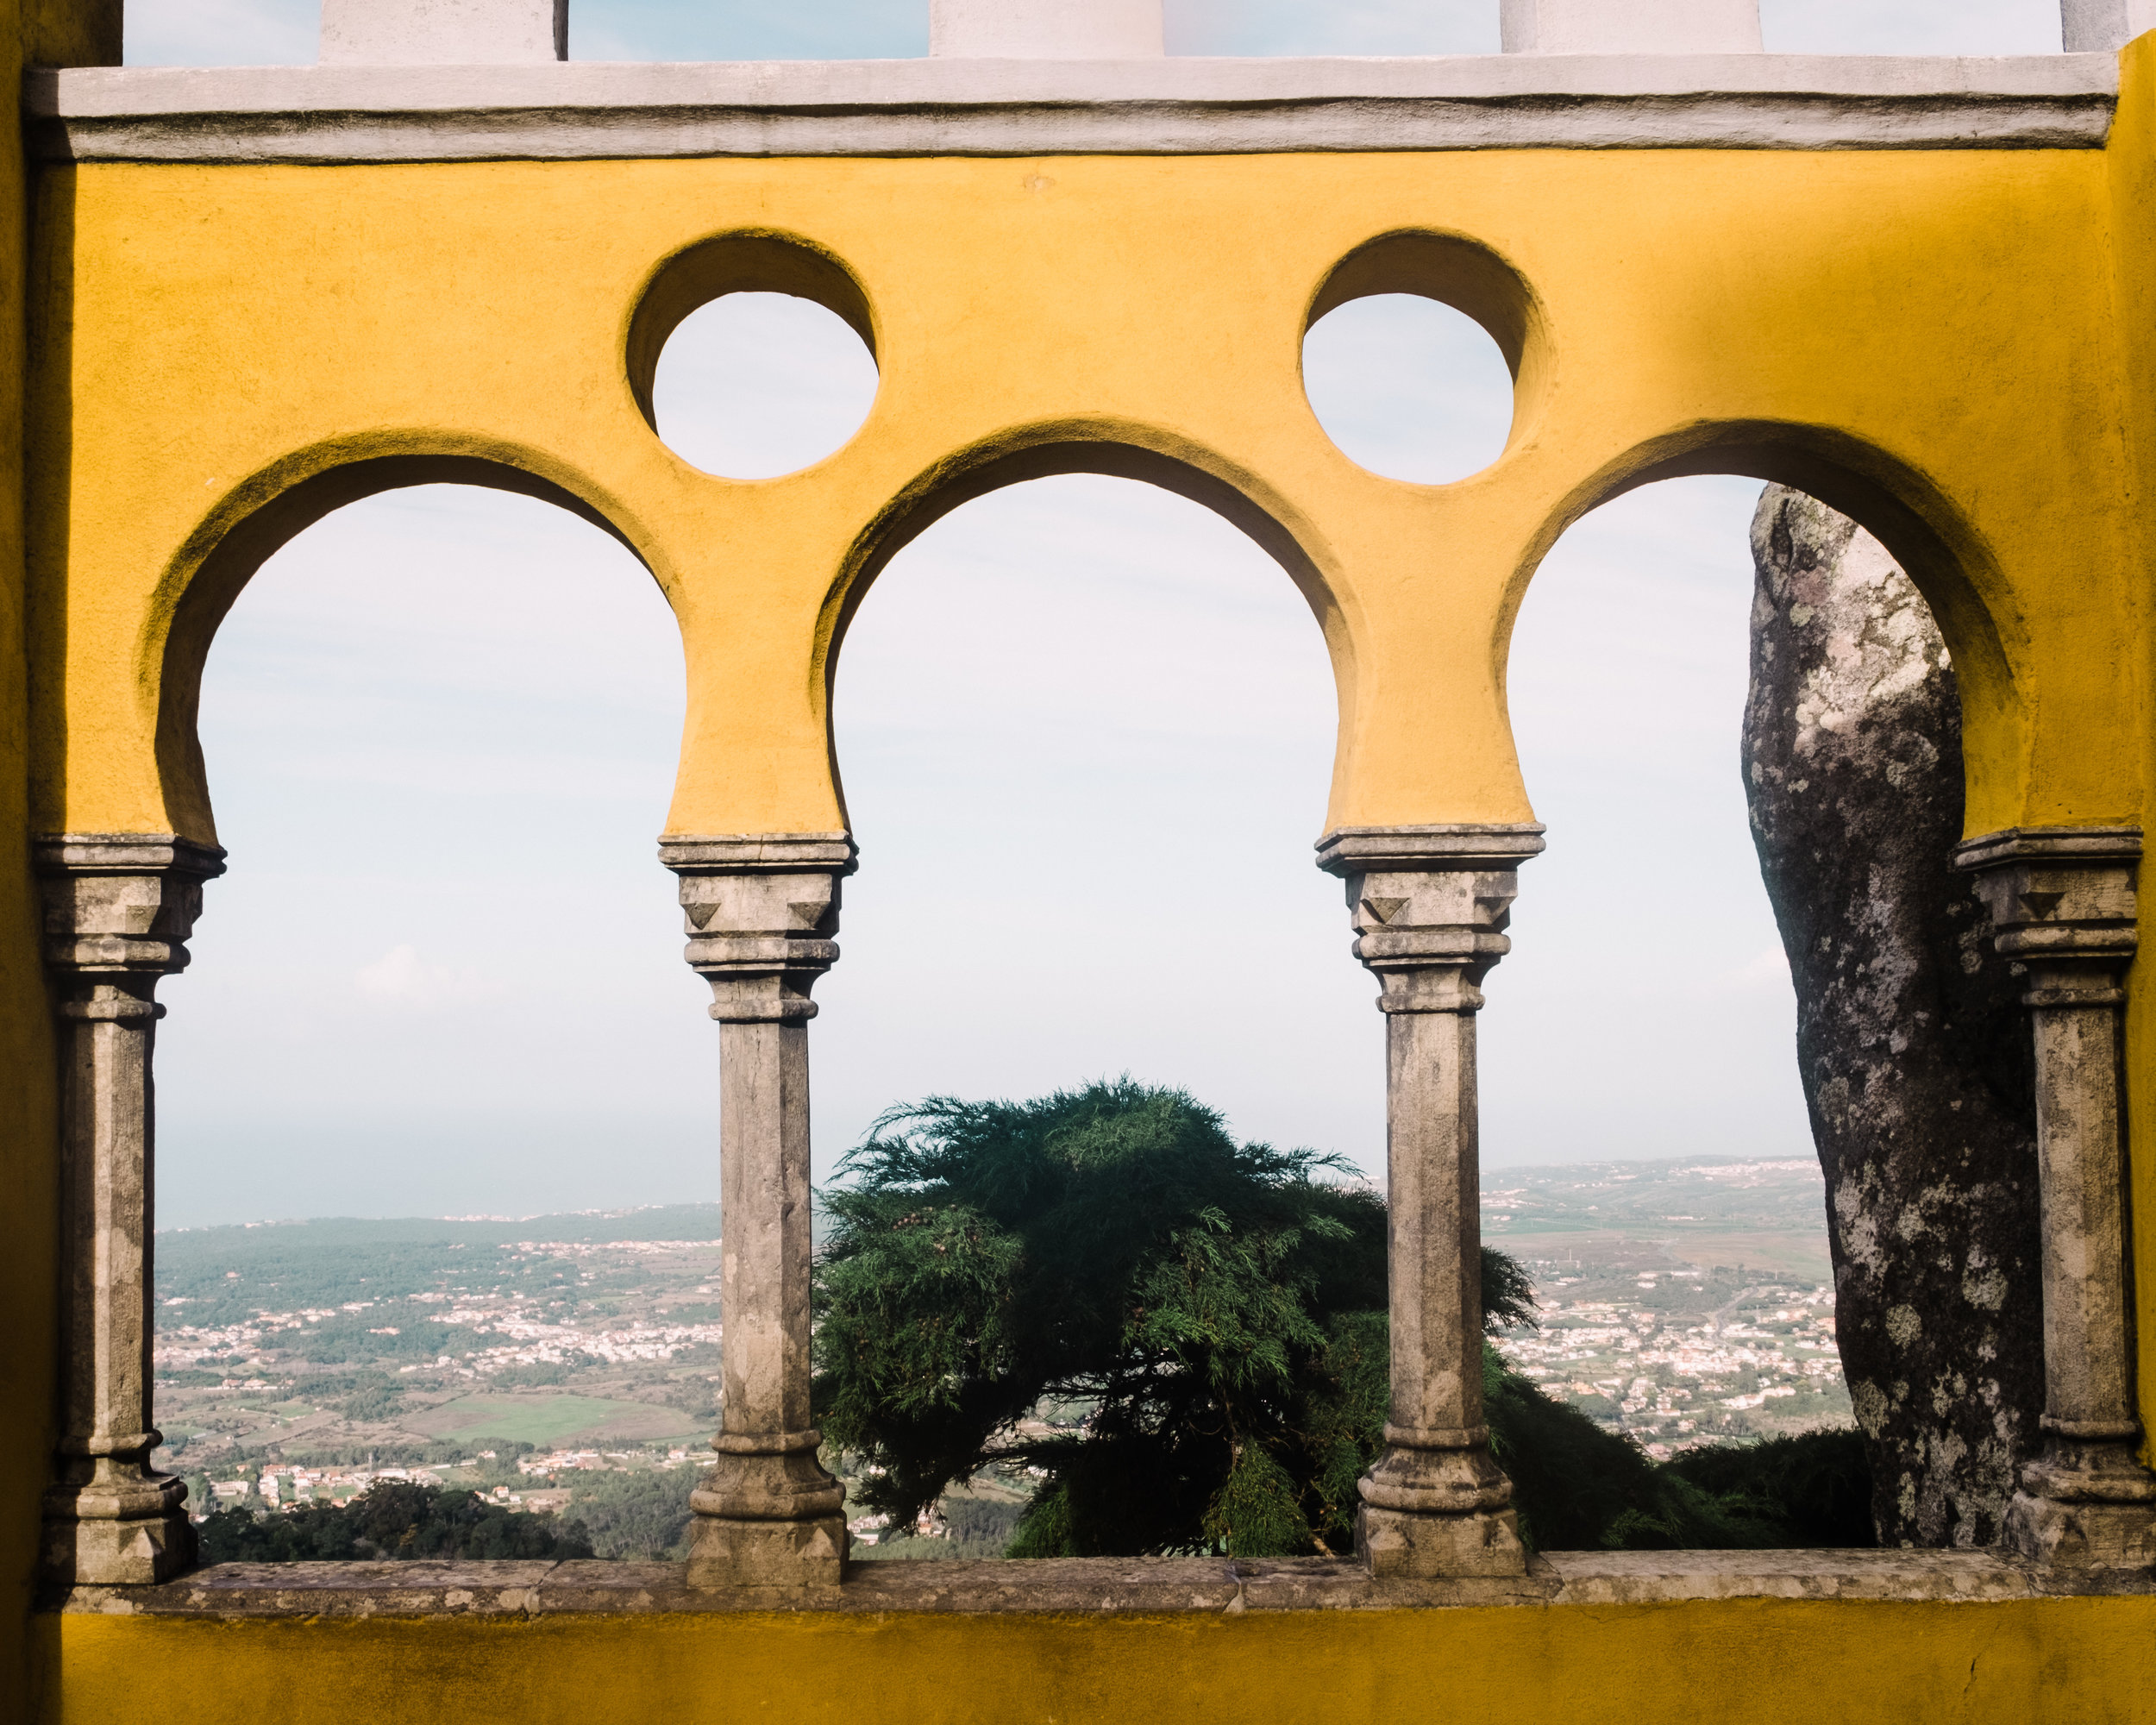 PenaPalace_Sintra_Portugal_JuliaMattis_Photo05.jpg